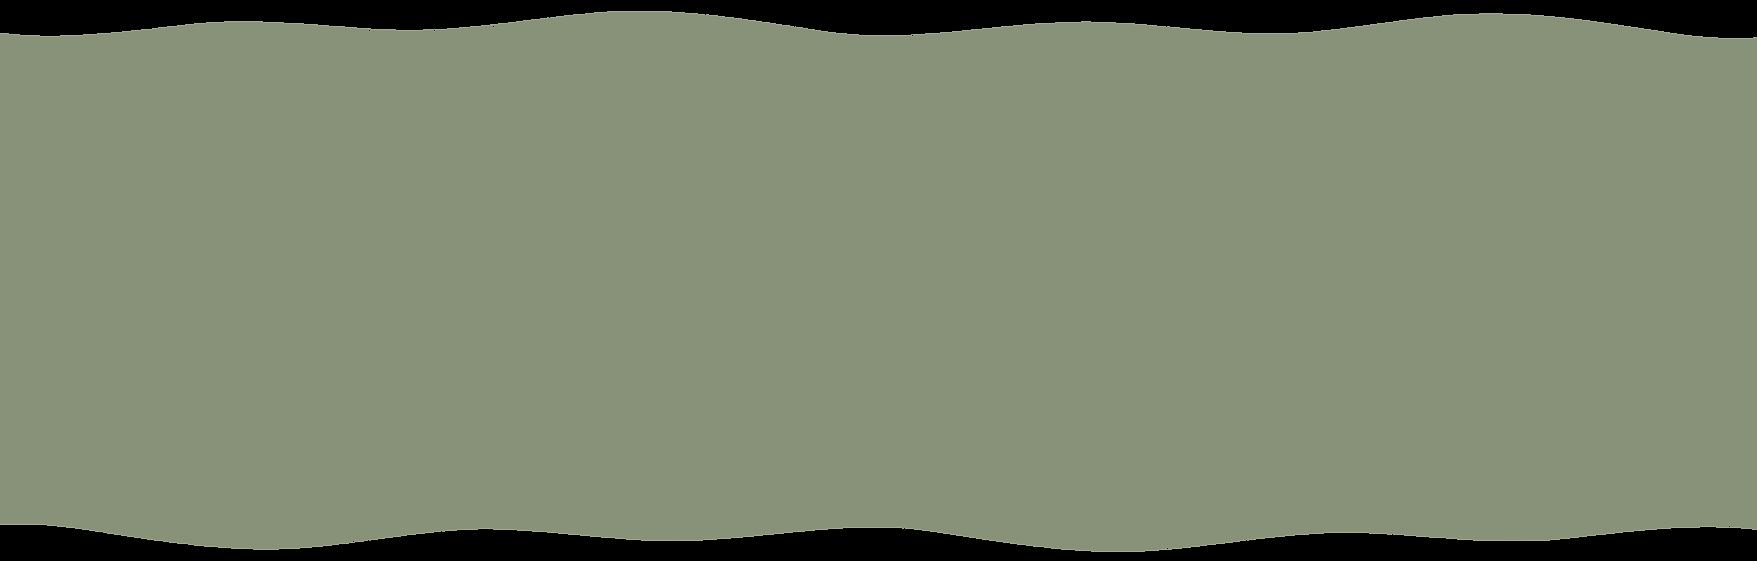 franja verde-31.png